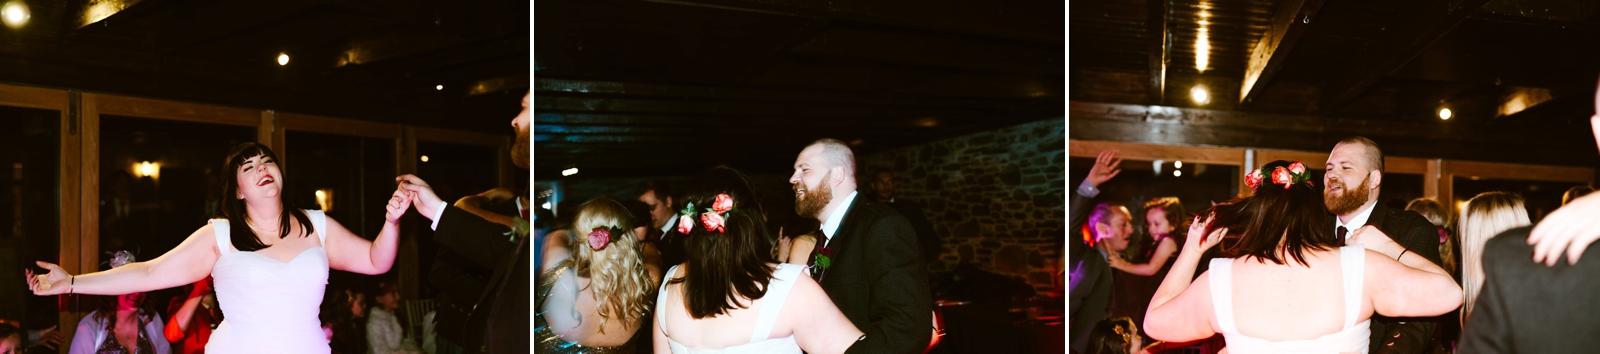 alternative-wedding-photography-scotland-katie-stephen-aikwood-tower-514.jpg